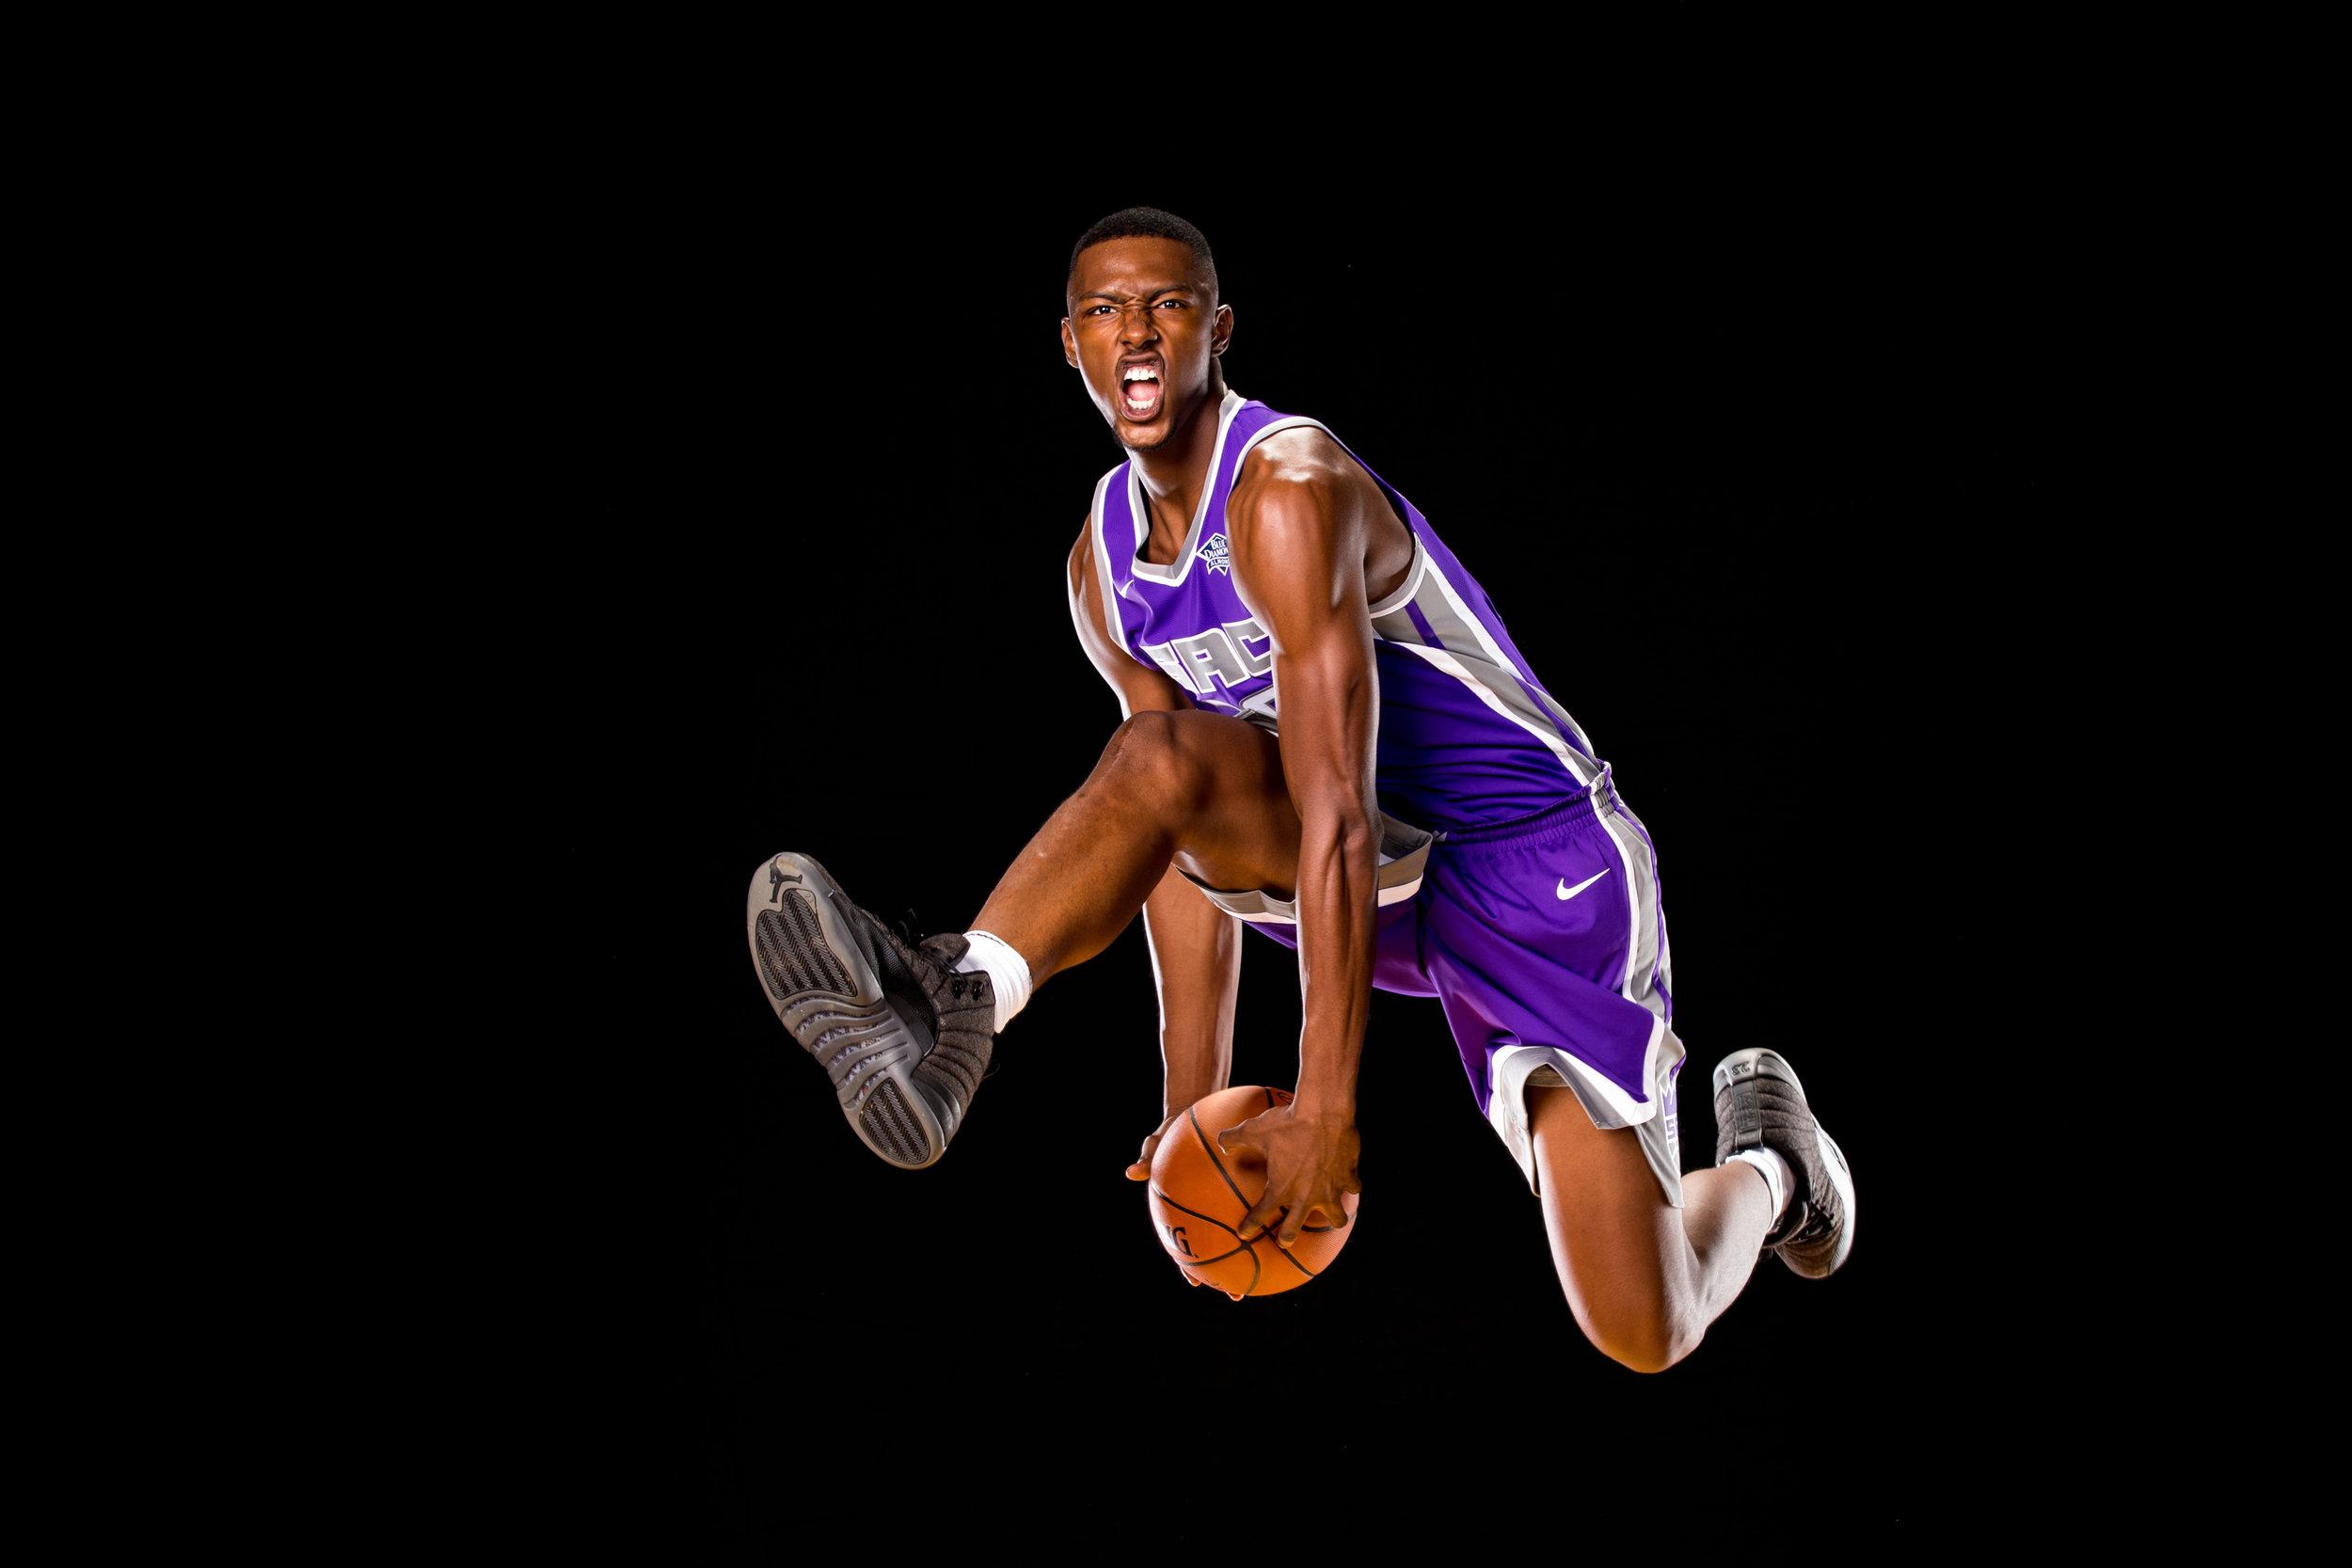 Harry Giles, Sacramento Kings. 2017 NBA Rookie photo shoot, Tarrytown, New York. Canon 1DX, EF 70-200mm f2.8L